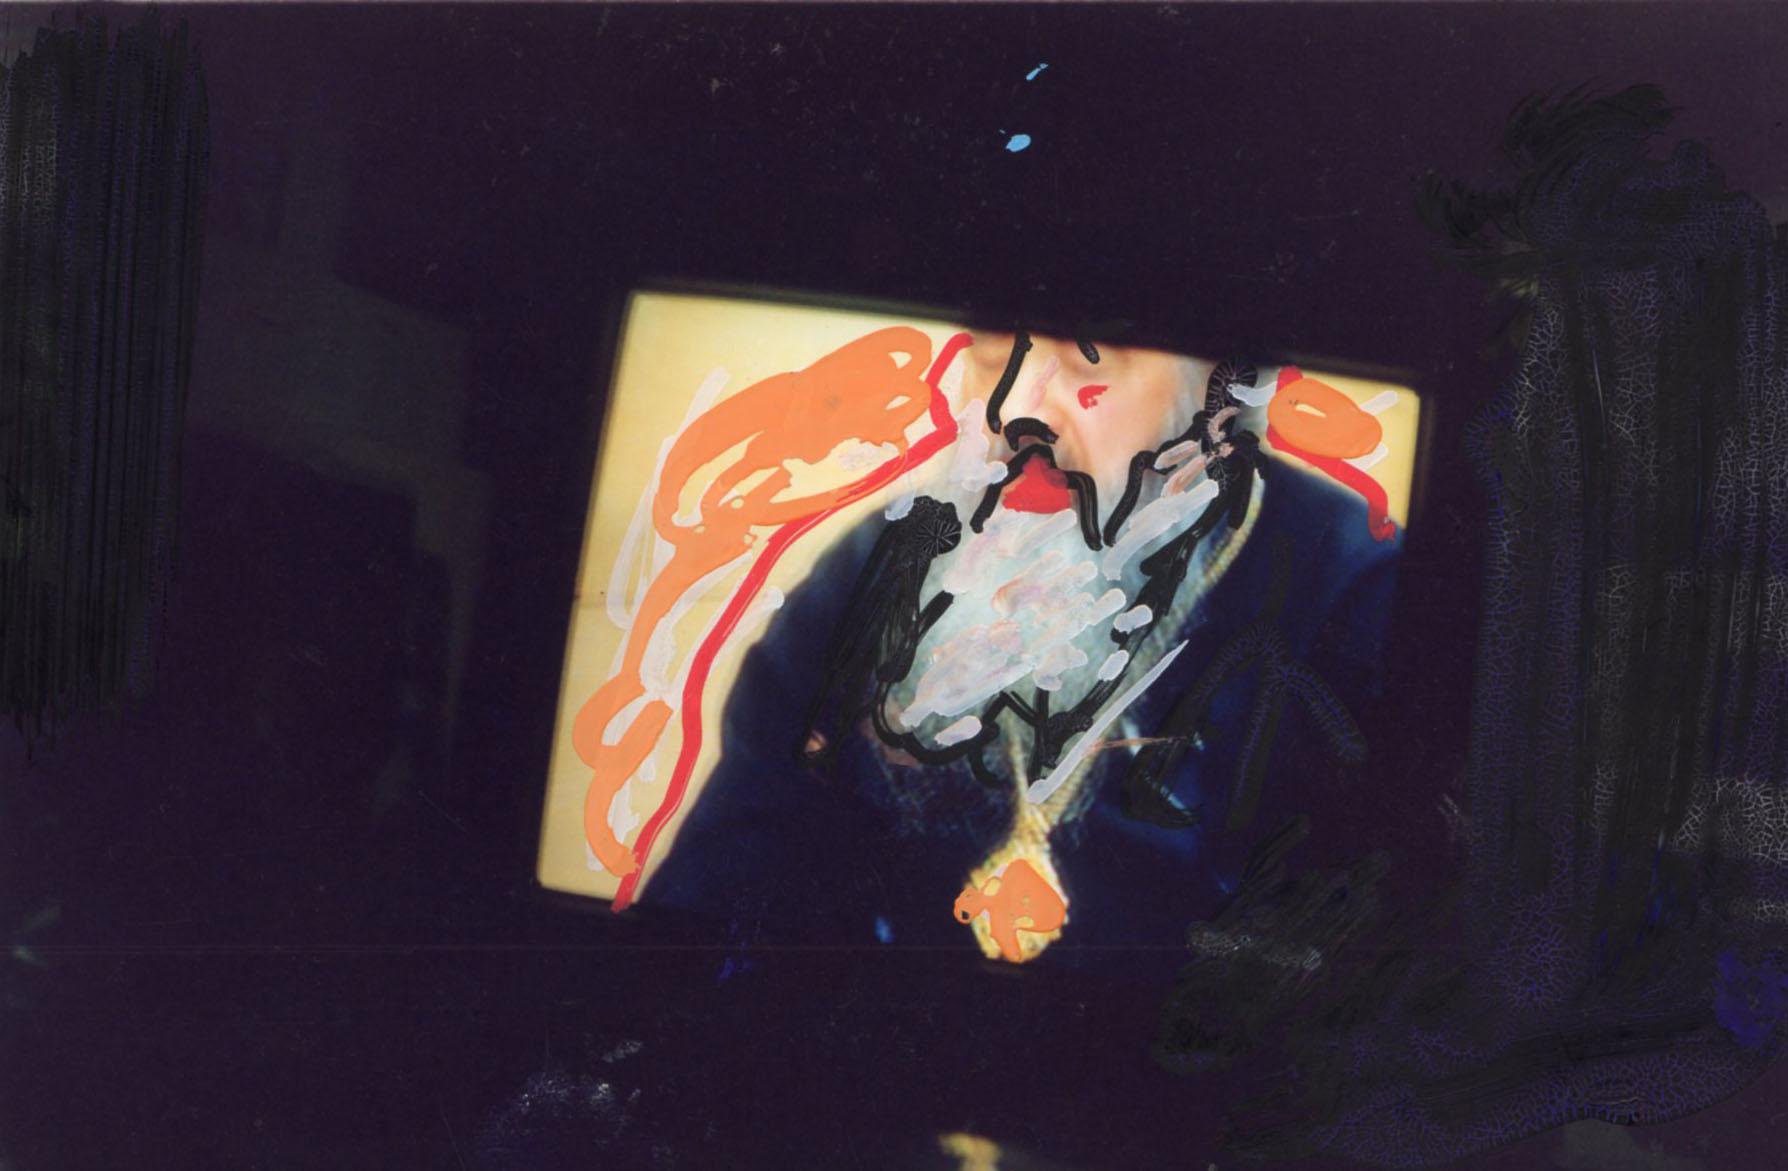 Mario Schifano, Untitled 2020, 1990/1995, mixed media on photograph, 10×15 cm